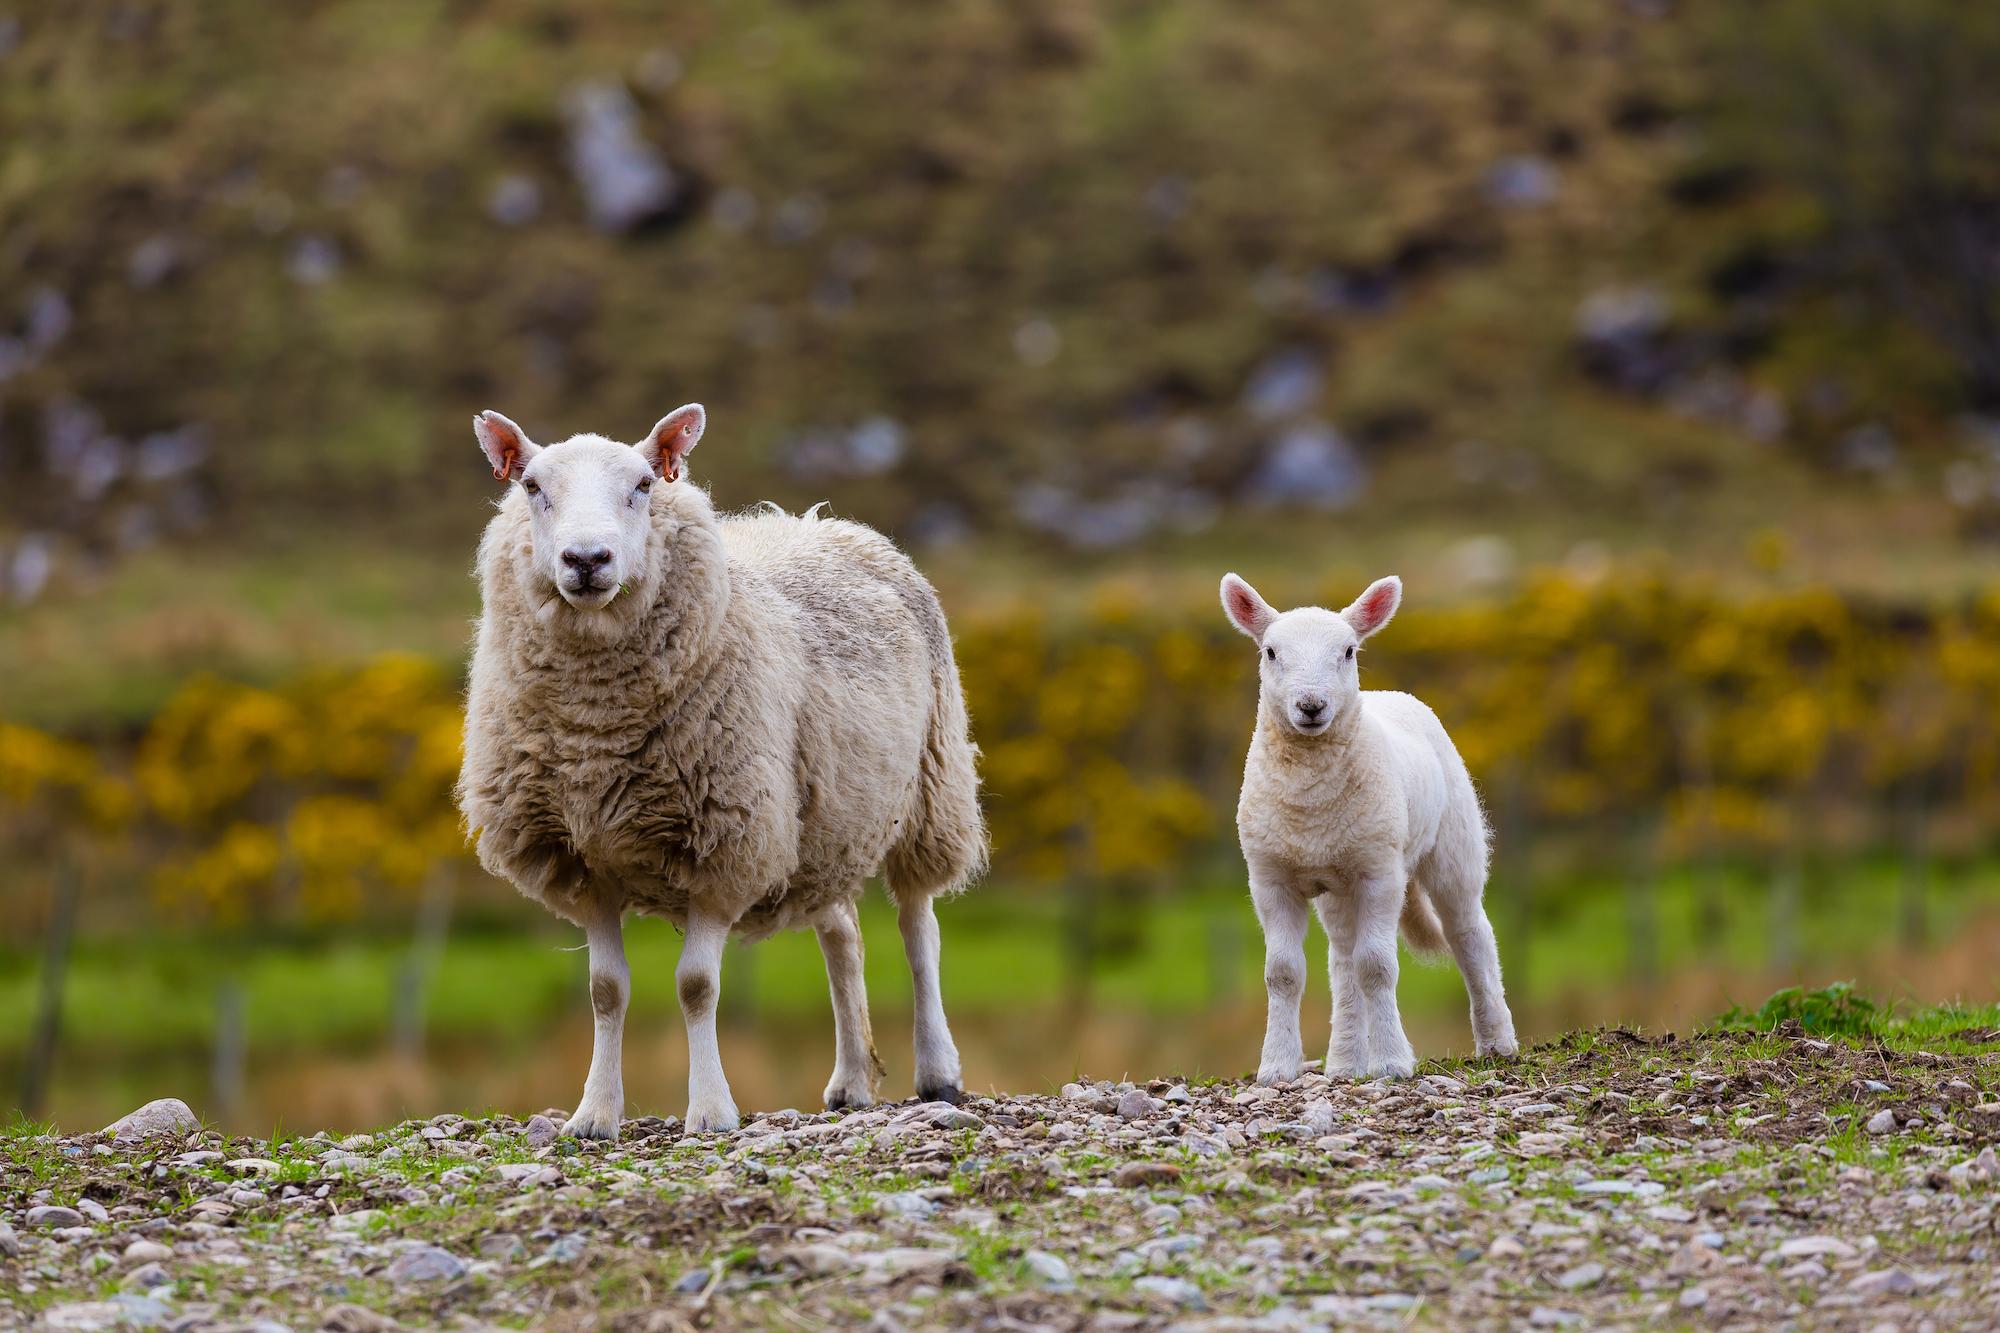 (174) (PO) Sheep on Farm, Ben Hope, Kyle of Tongue, Sutherland, Scotland.jpg